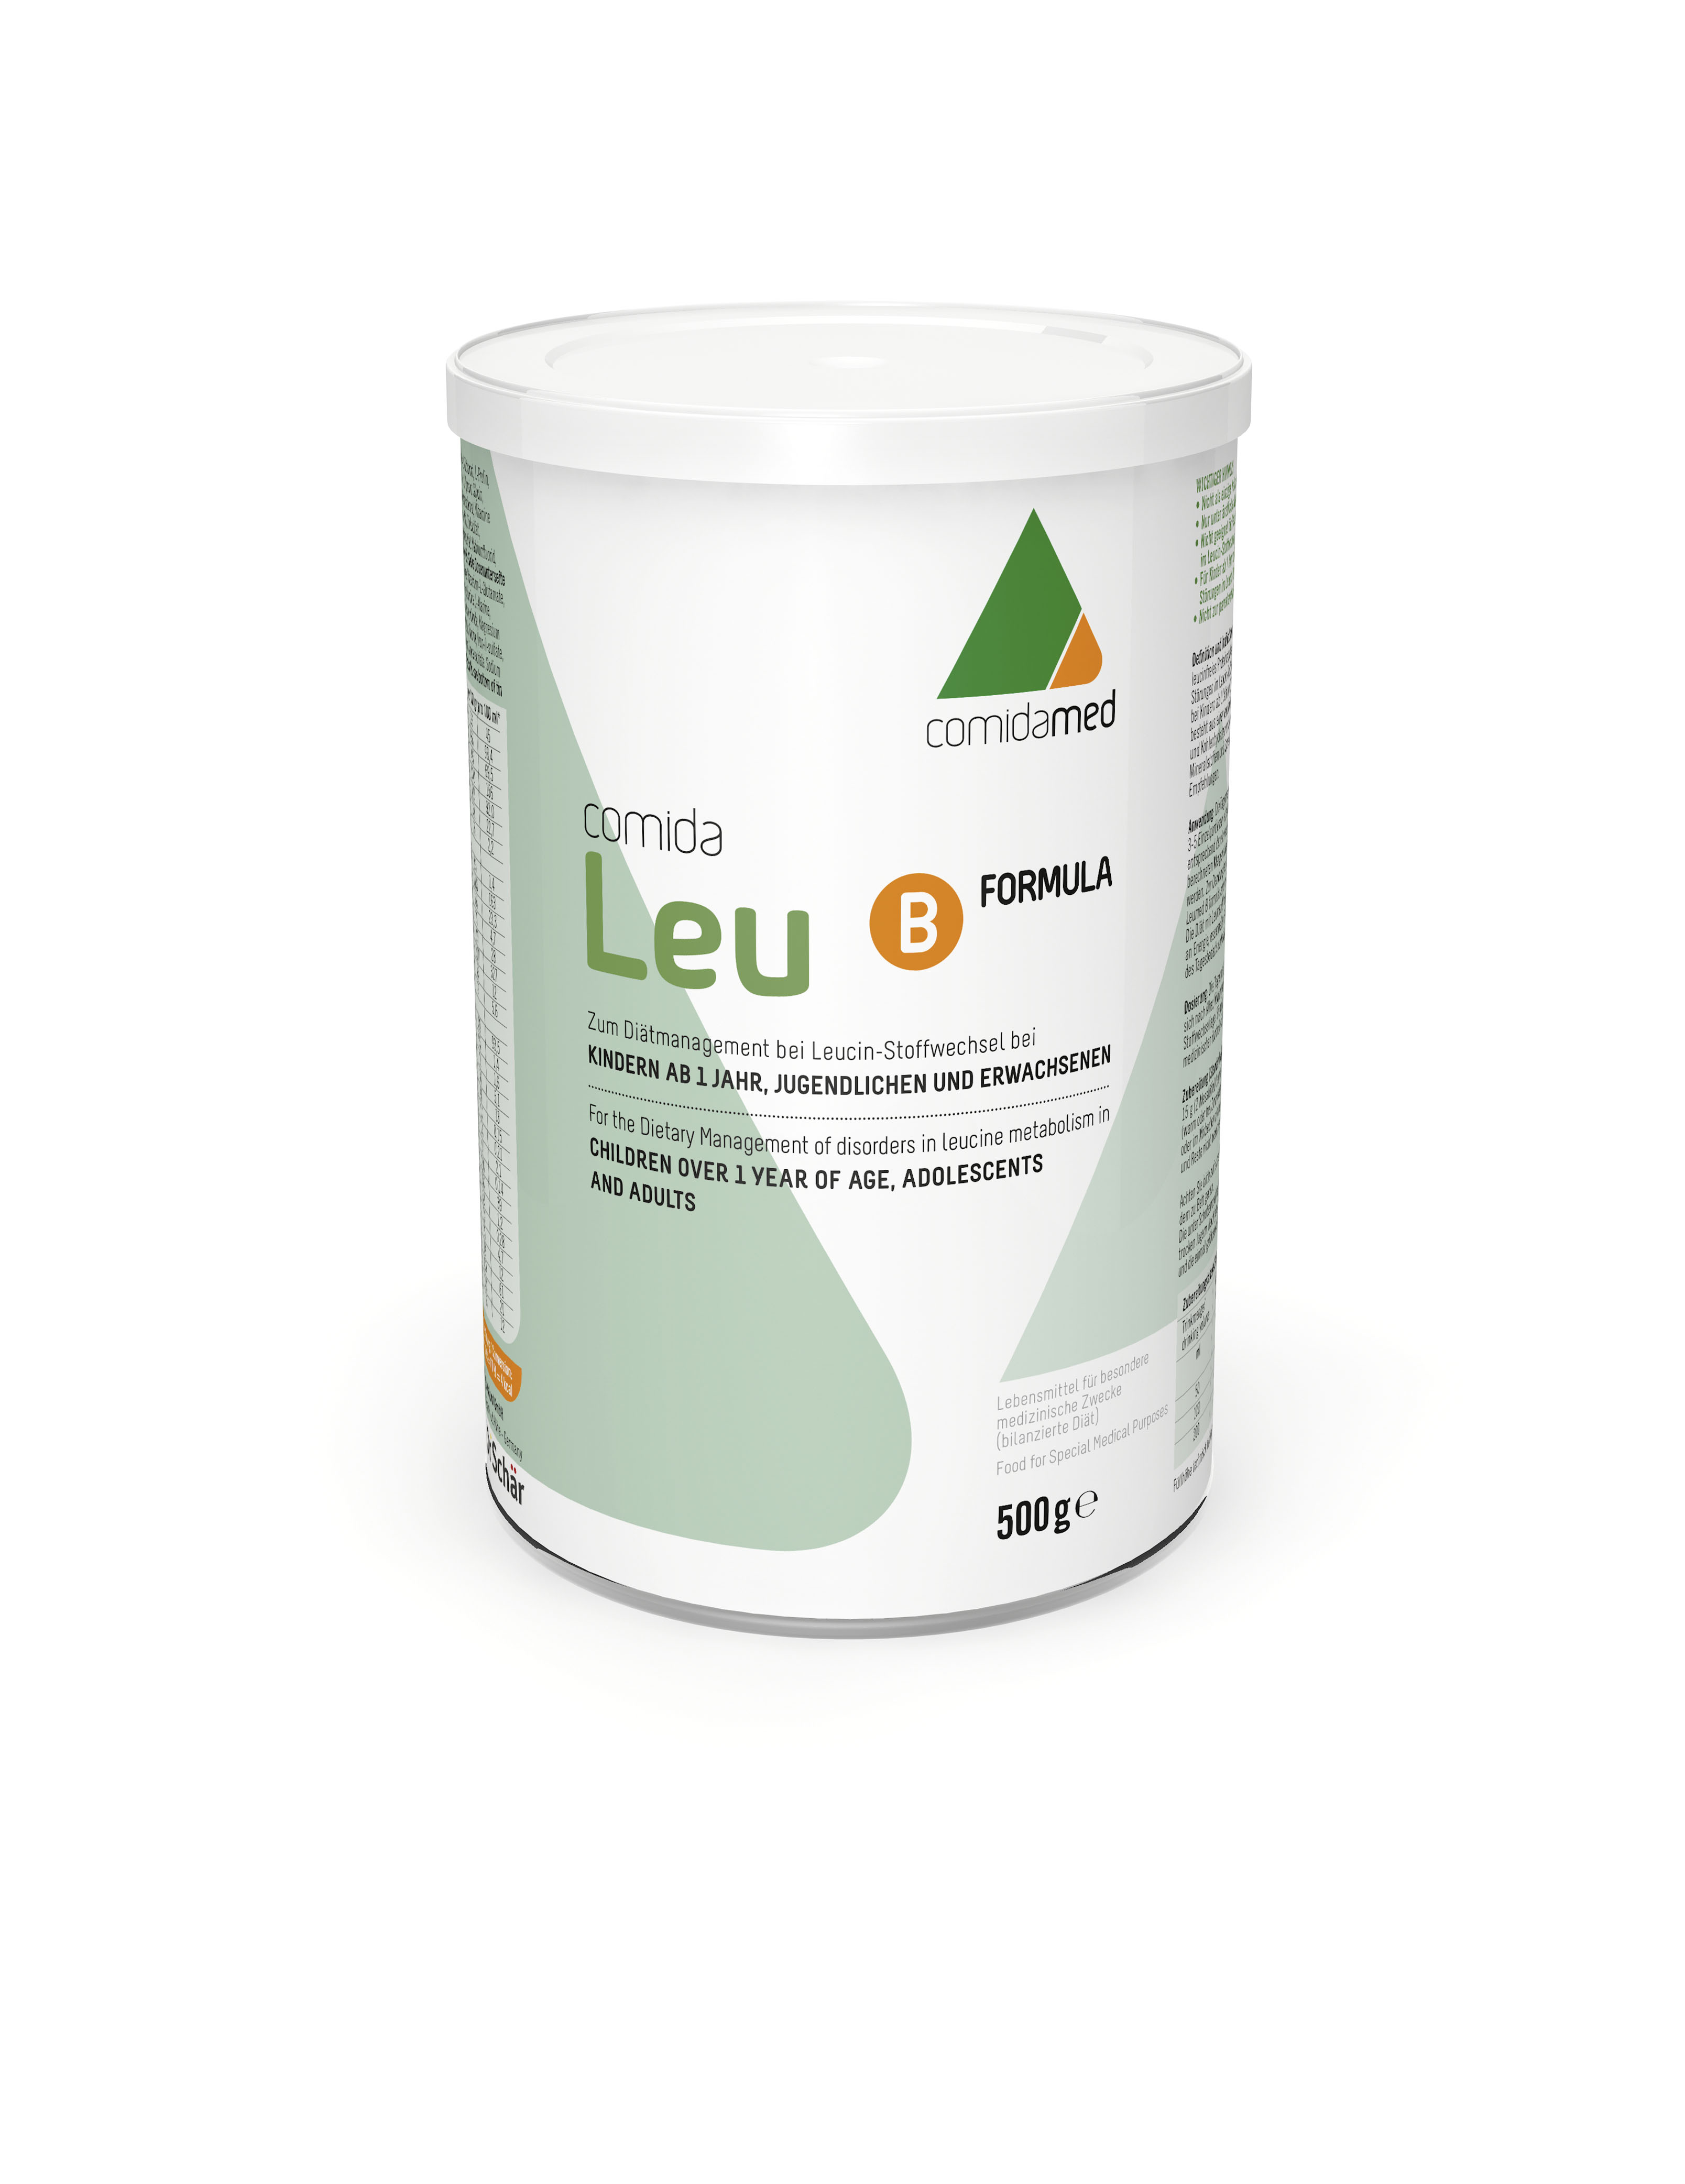 comida-Leu B FORMULA